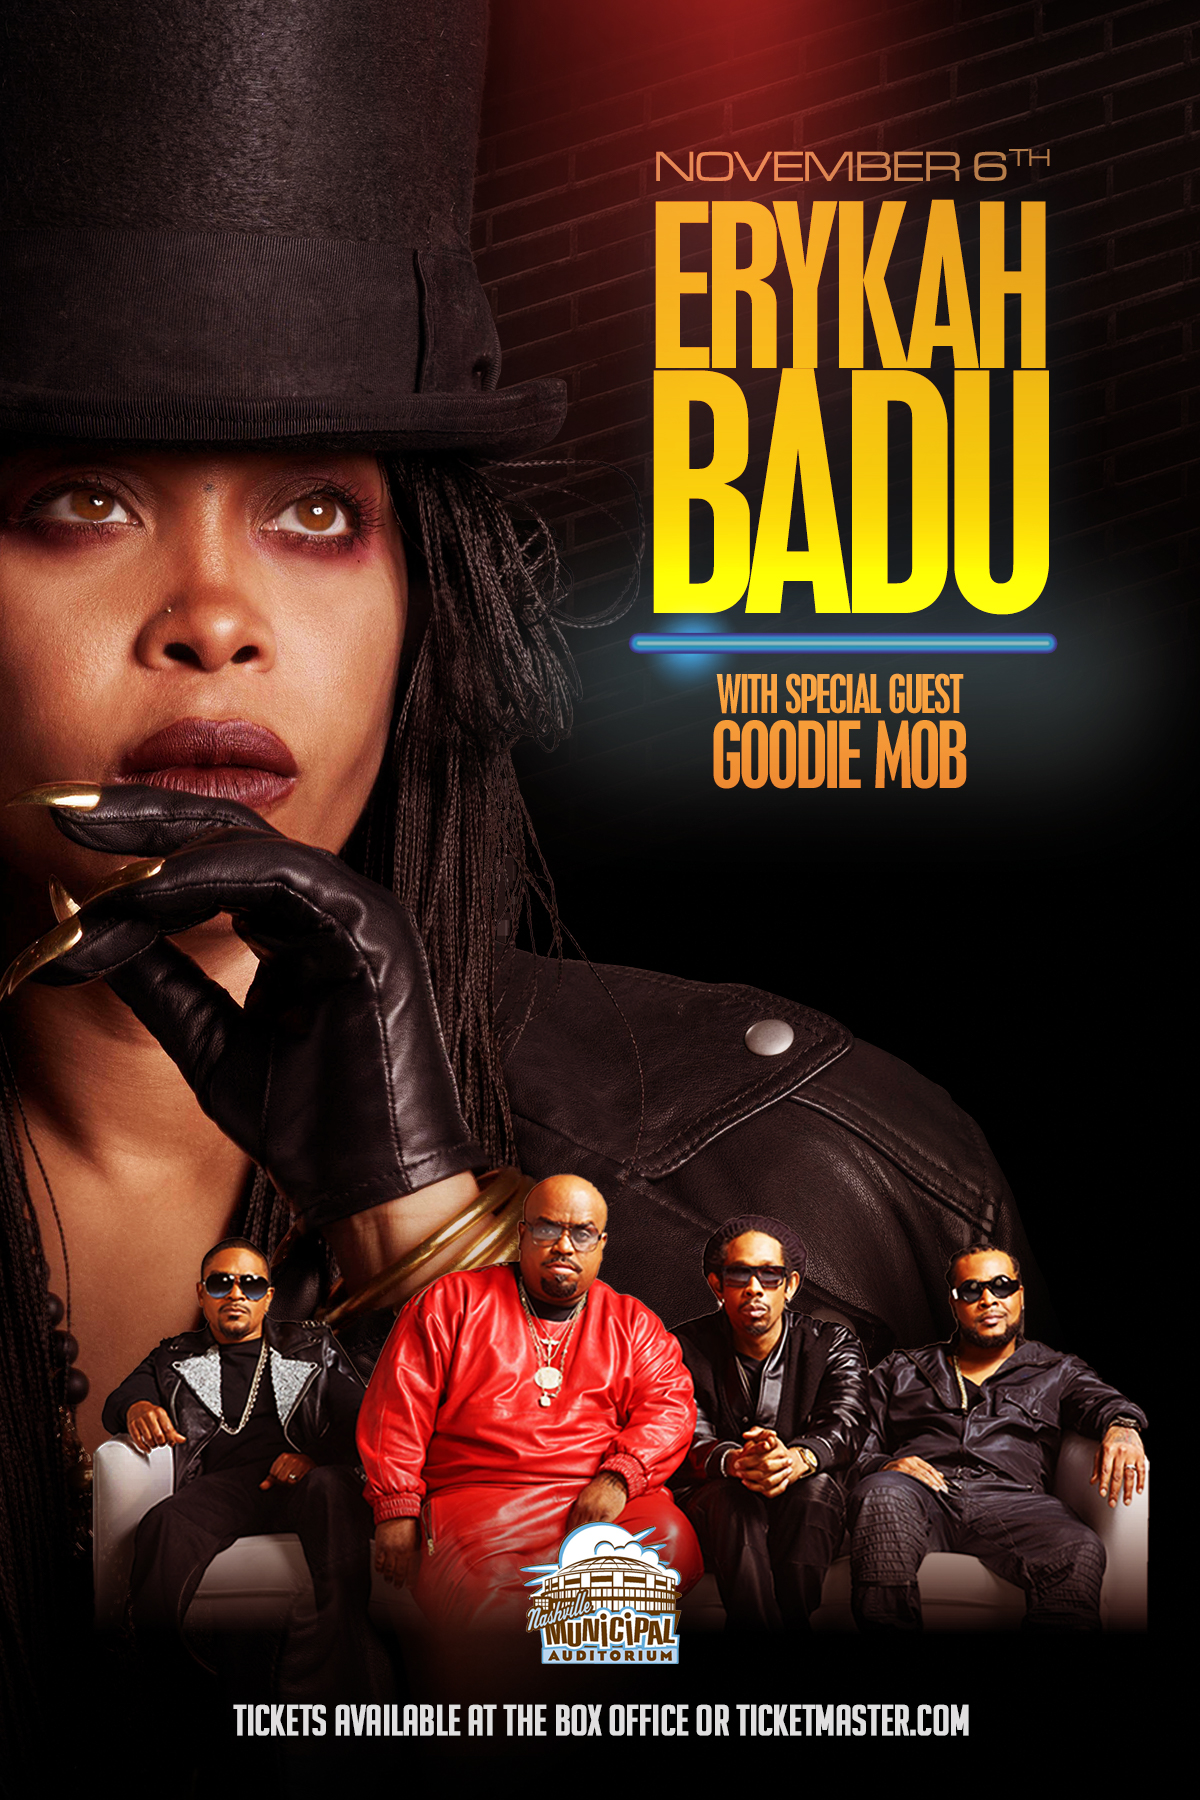 Catch Erykah Badu + Goodie Mob LIVE at Nashville Municipal Auditorium